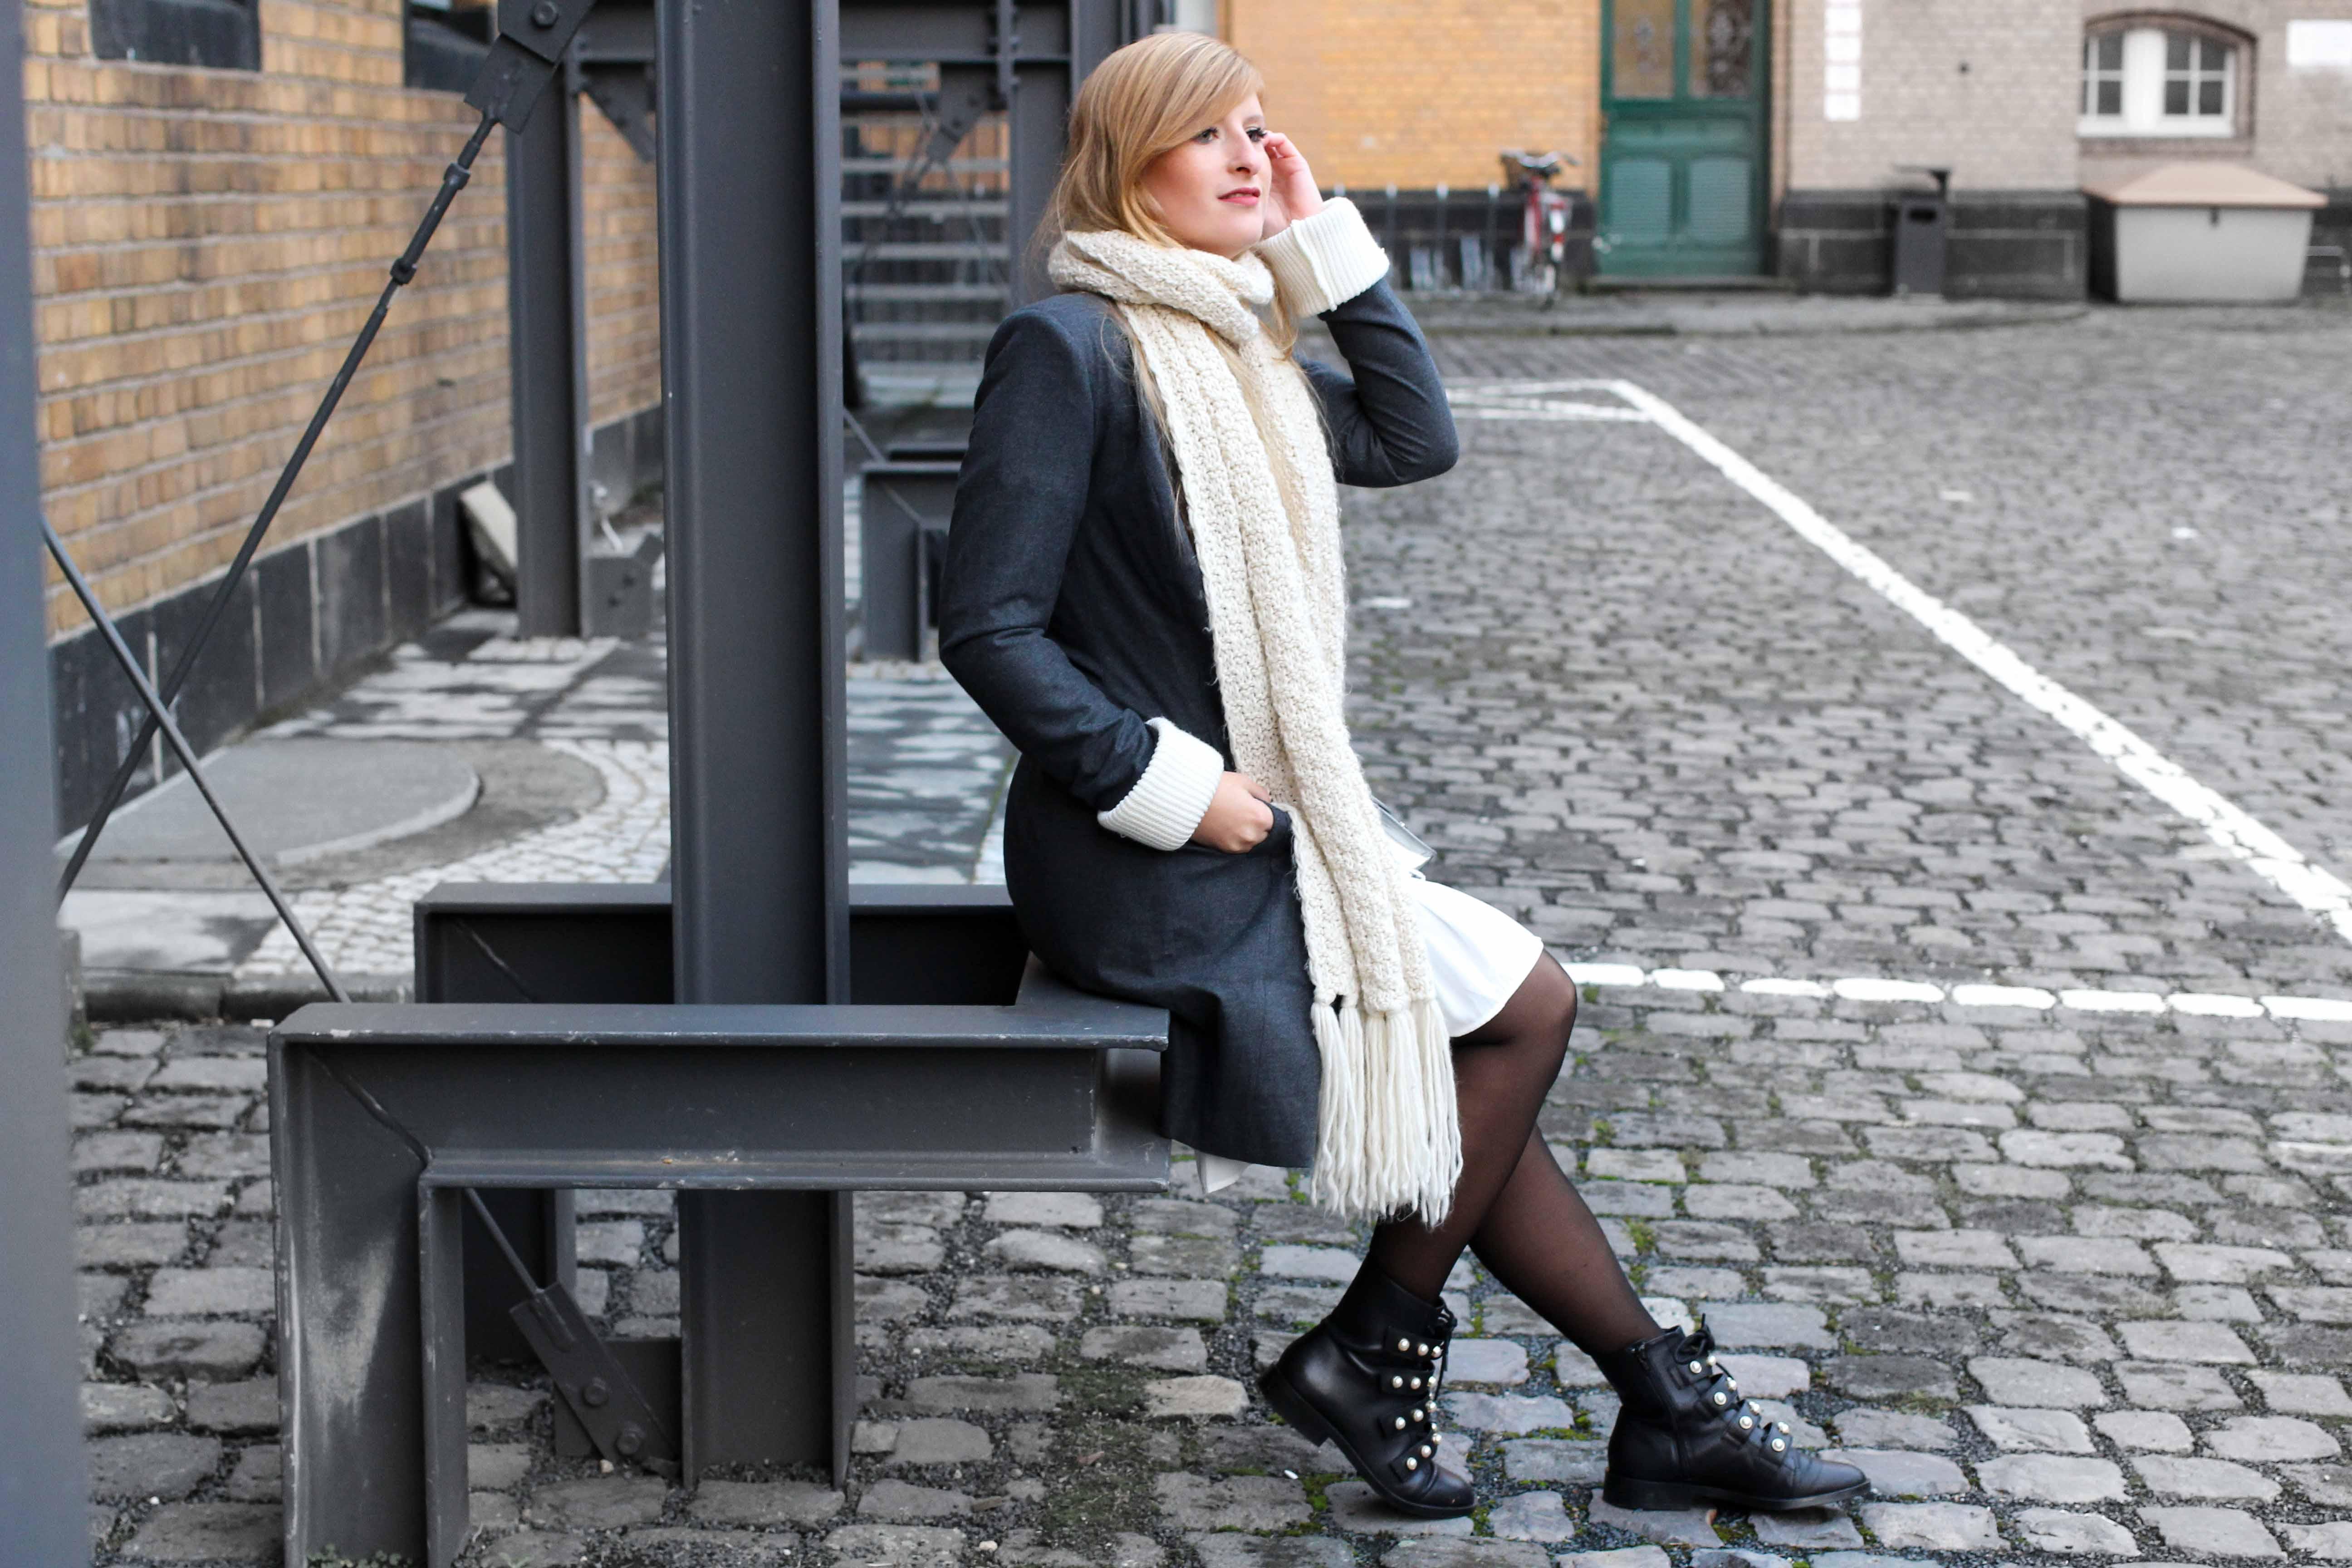 Winter-Layering weißes Kleid, Ripped Pullover Asos schwarze Strumpfhose Hunkemöller kombinieren Outfit Modeblog bonn 92